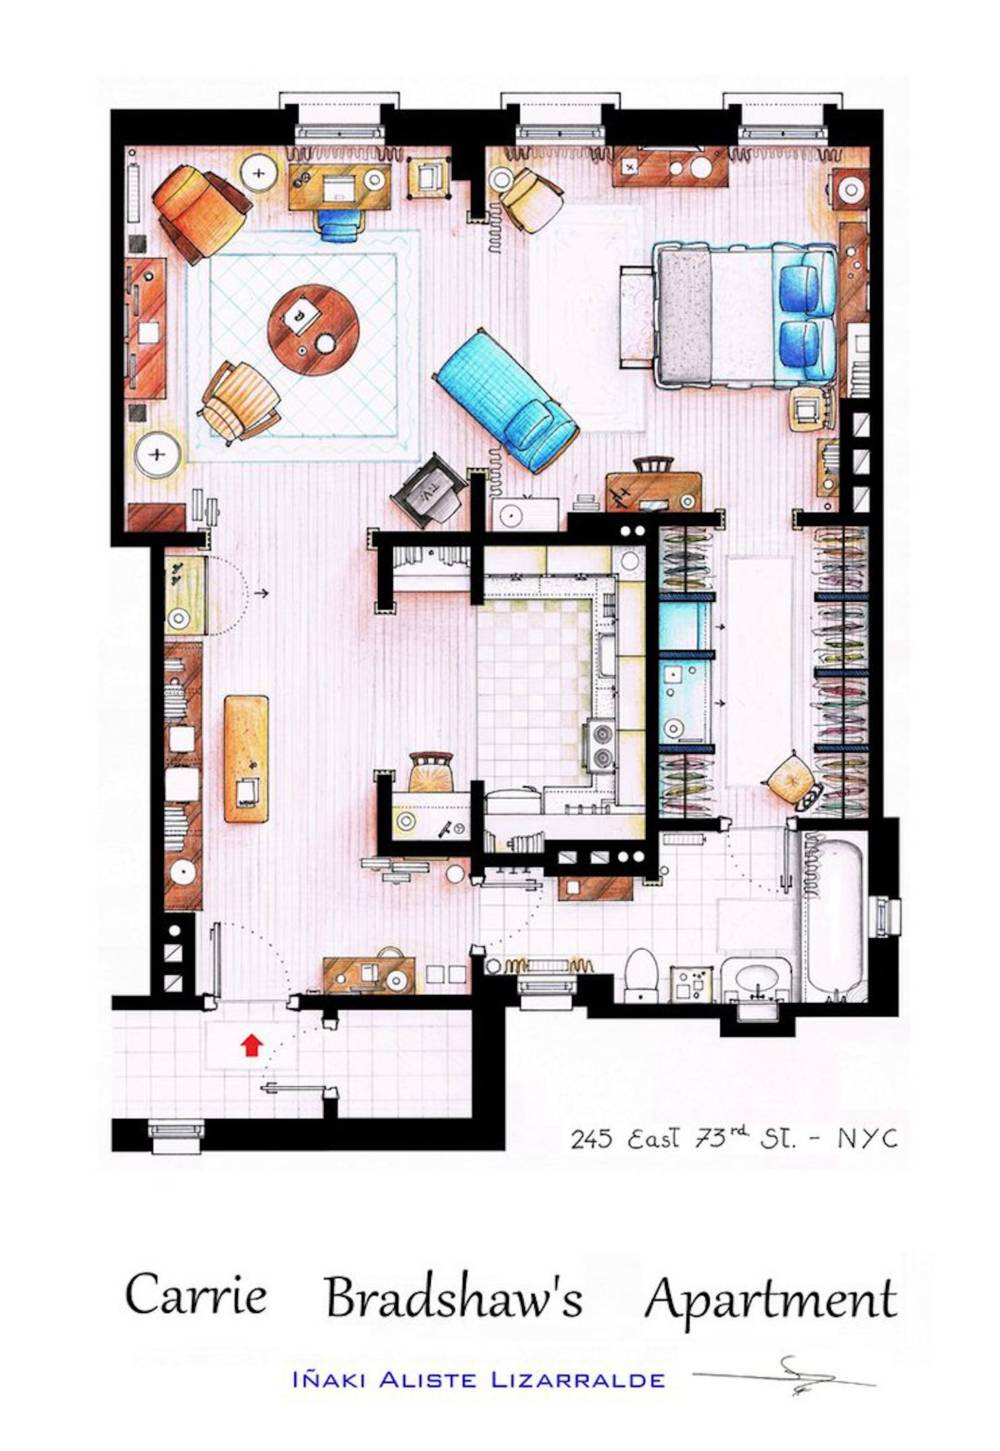 Carrie Bradshaws Apartment